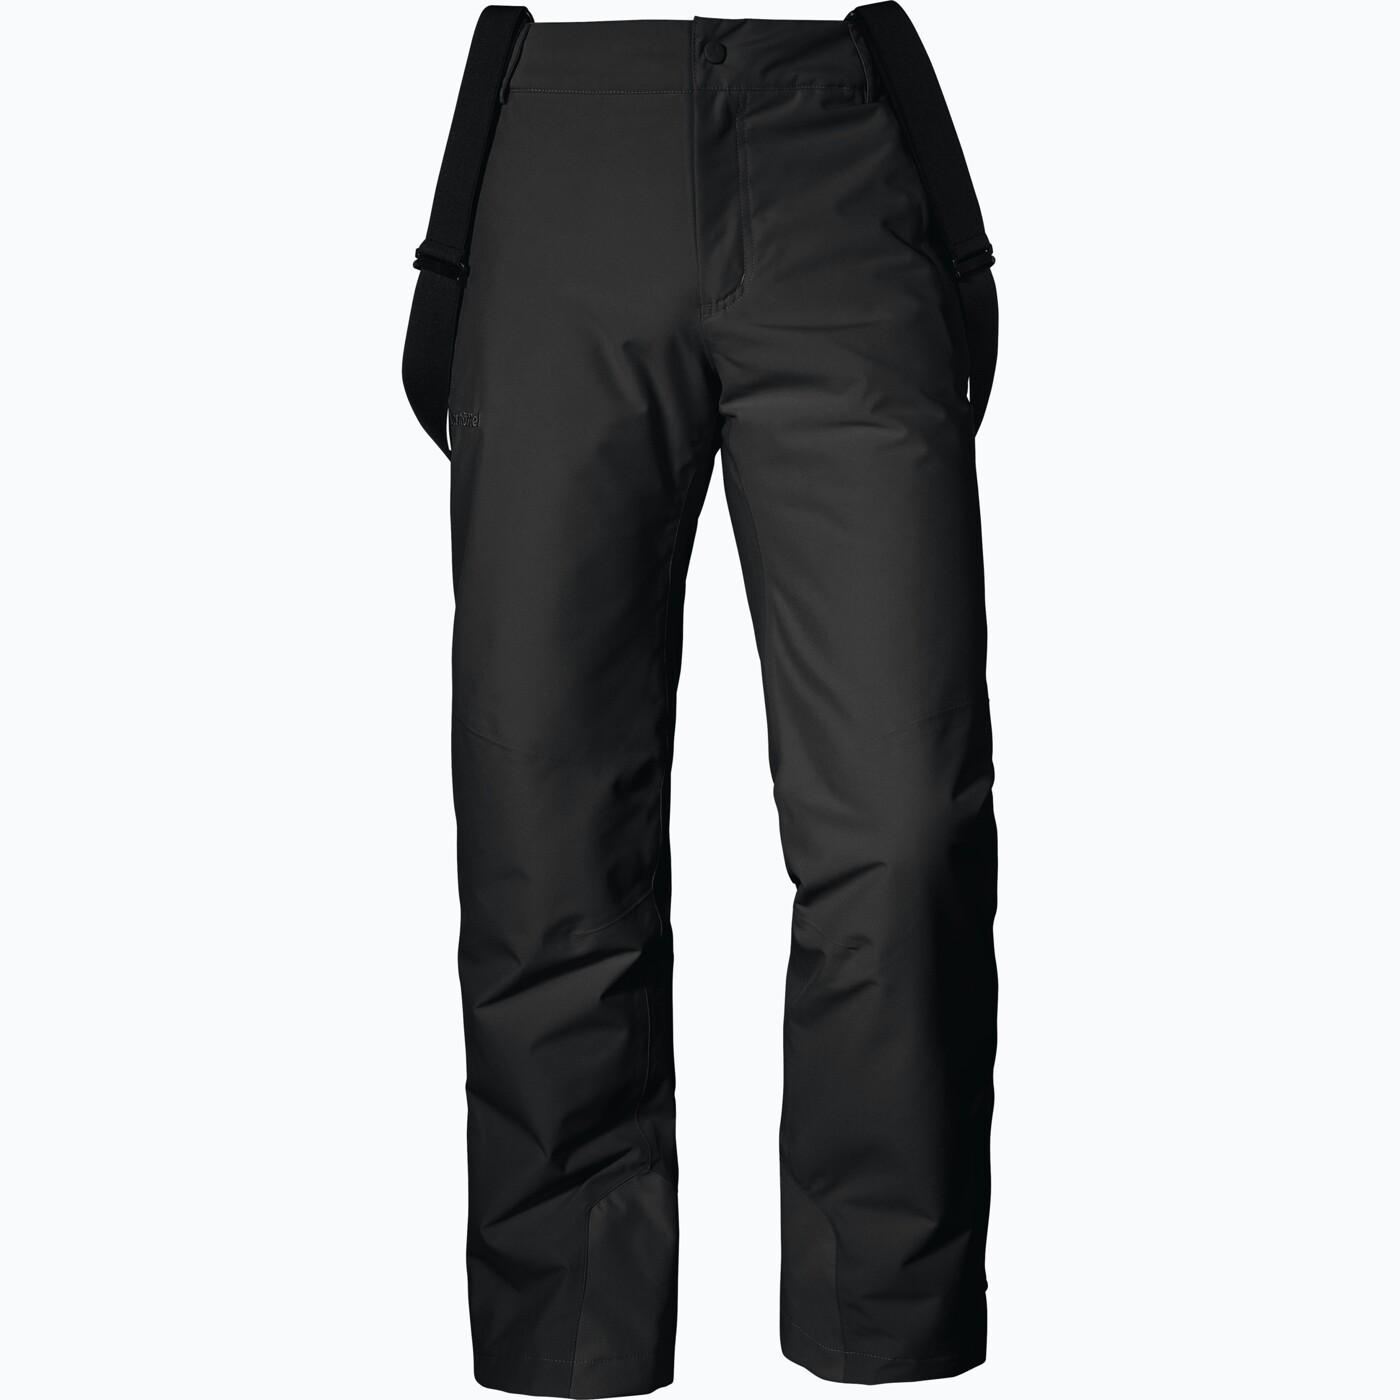 SCHÖFFEL Ski Pants Bern1 - Herren